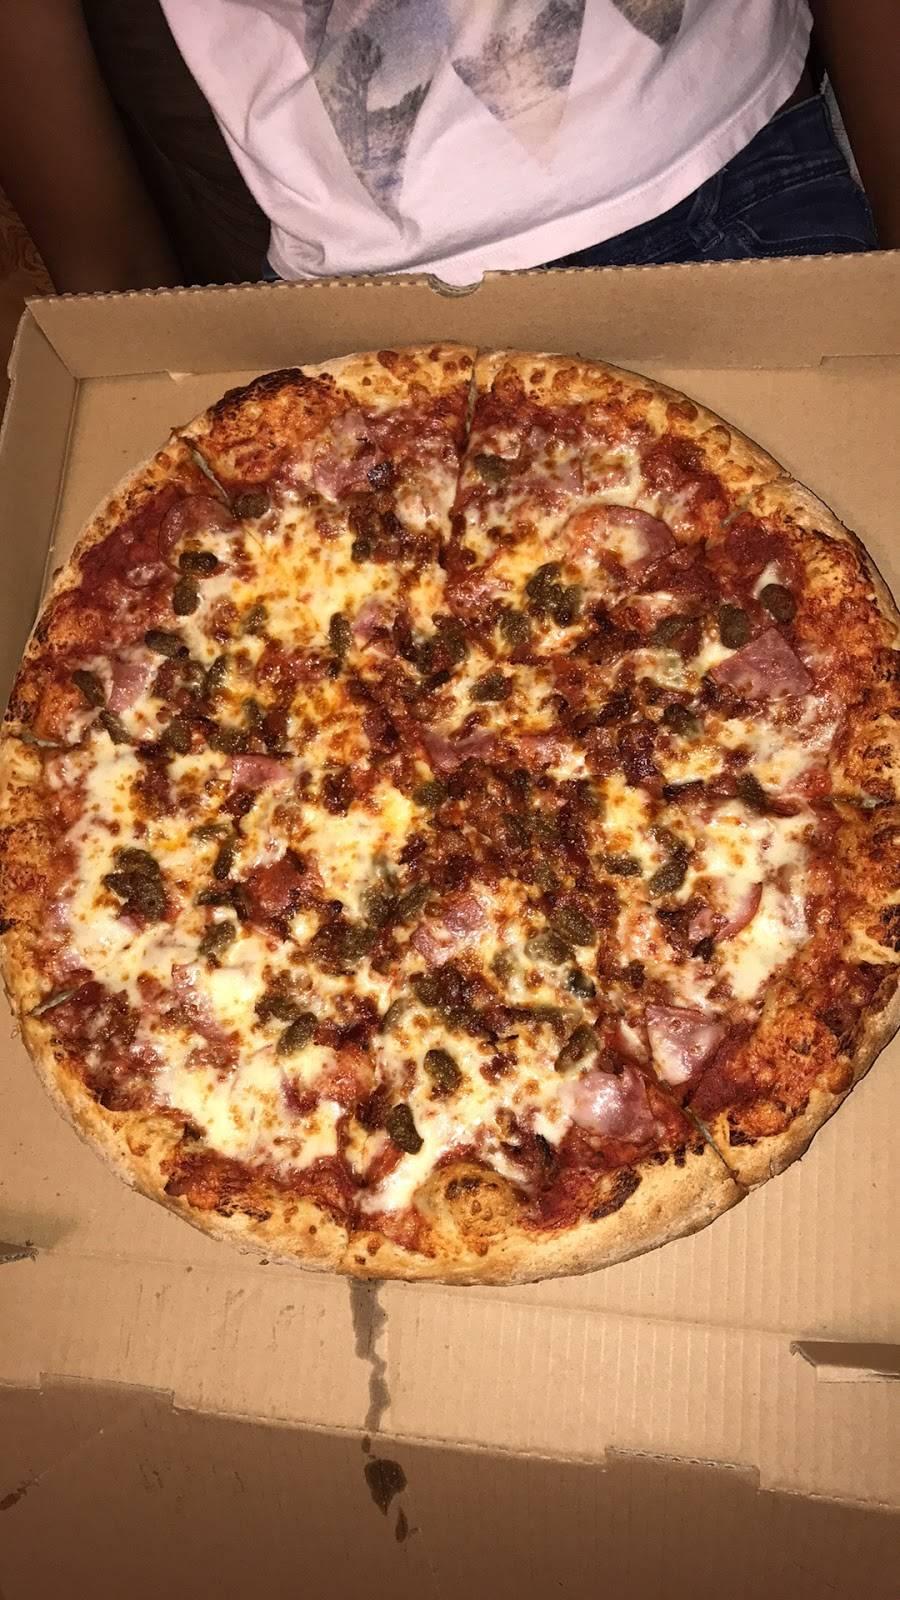 The Slice Pizza   restaurant   962 GA-122, Hahira, GA 31632, USA   2297941222 OR +1 229-794-1222